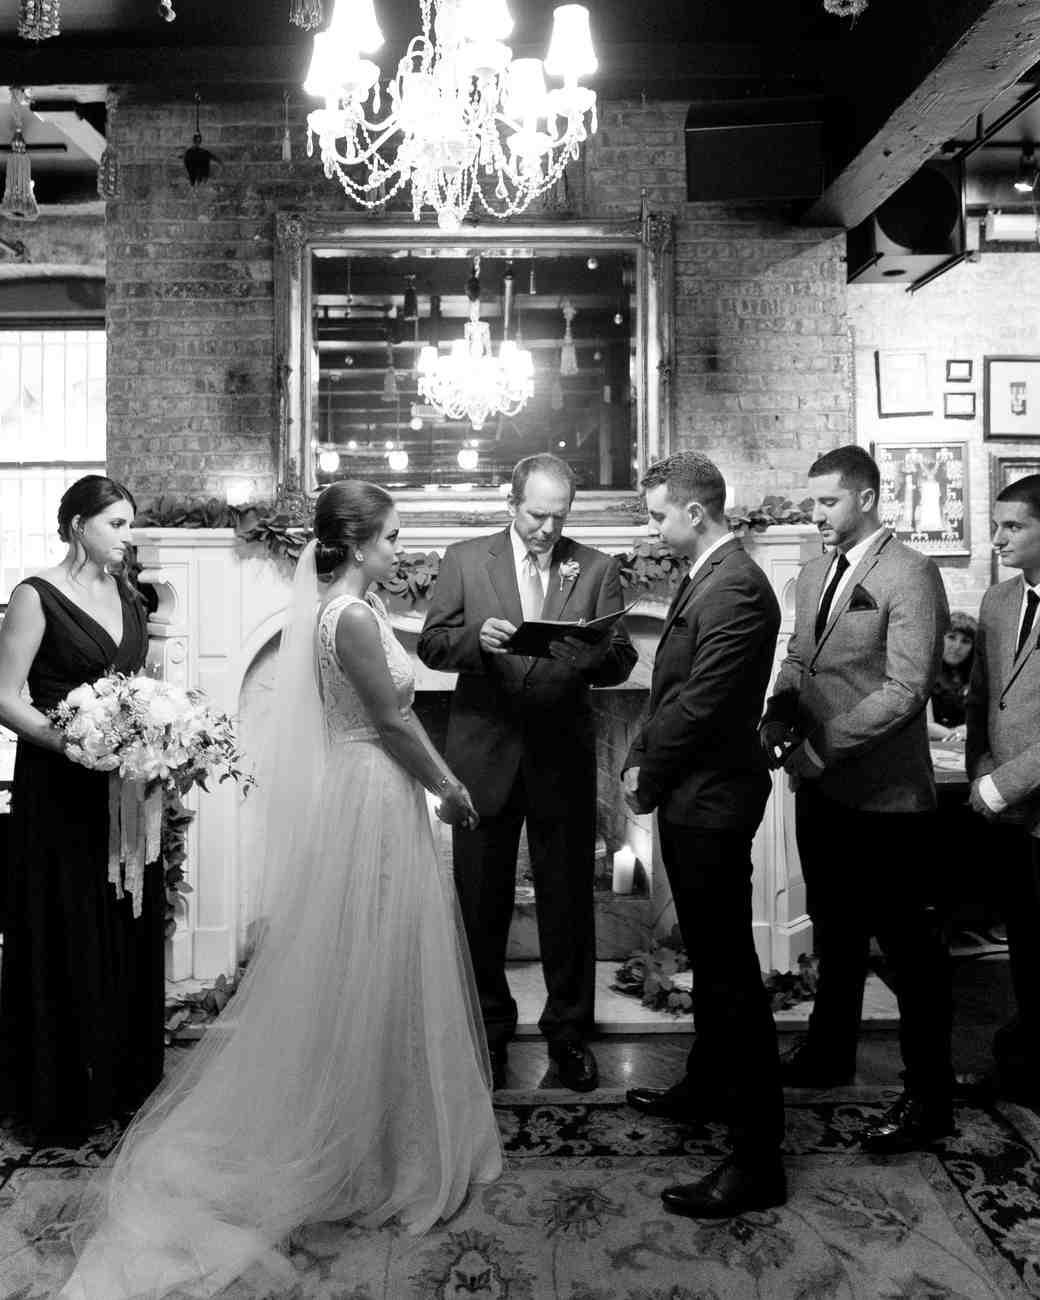 bianca-bryen-wedding-ceremony-284-s112509-0216.jpg